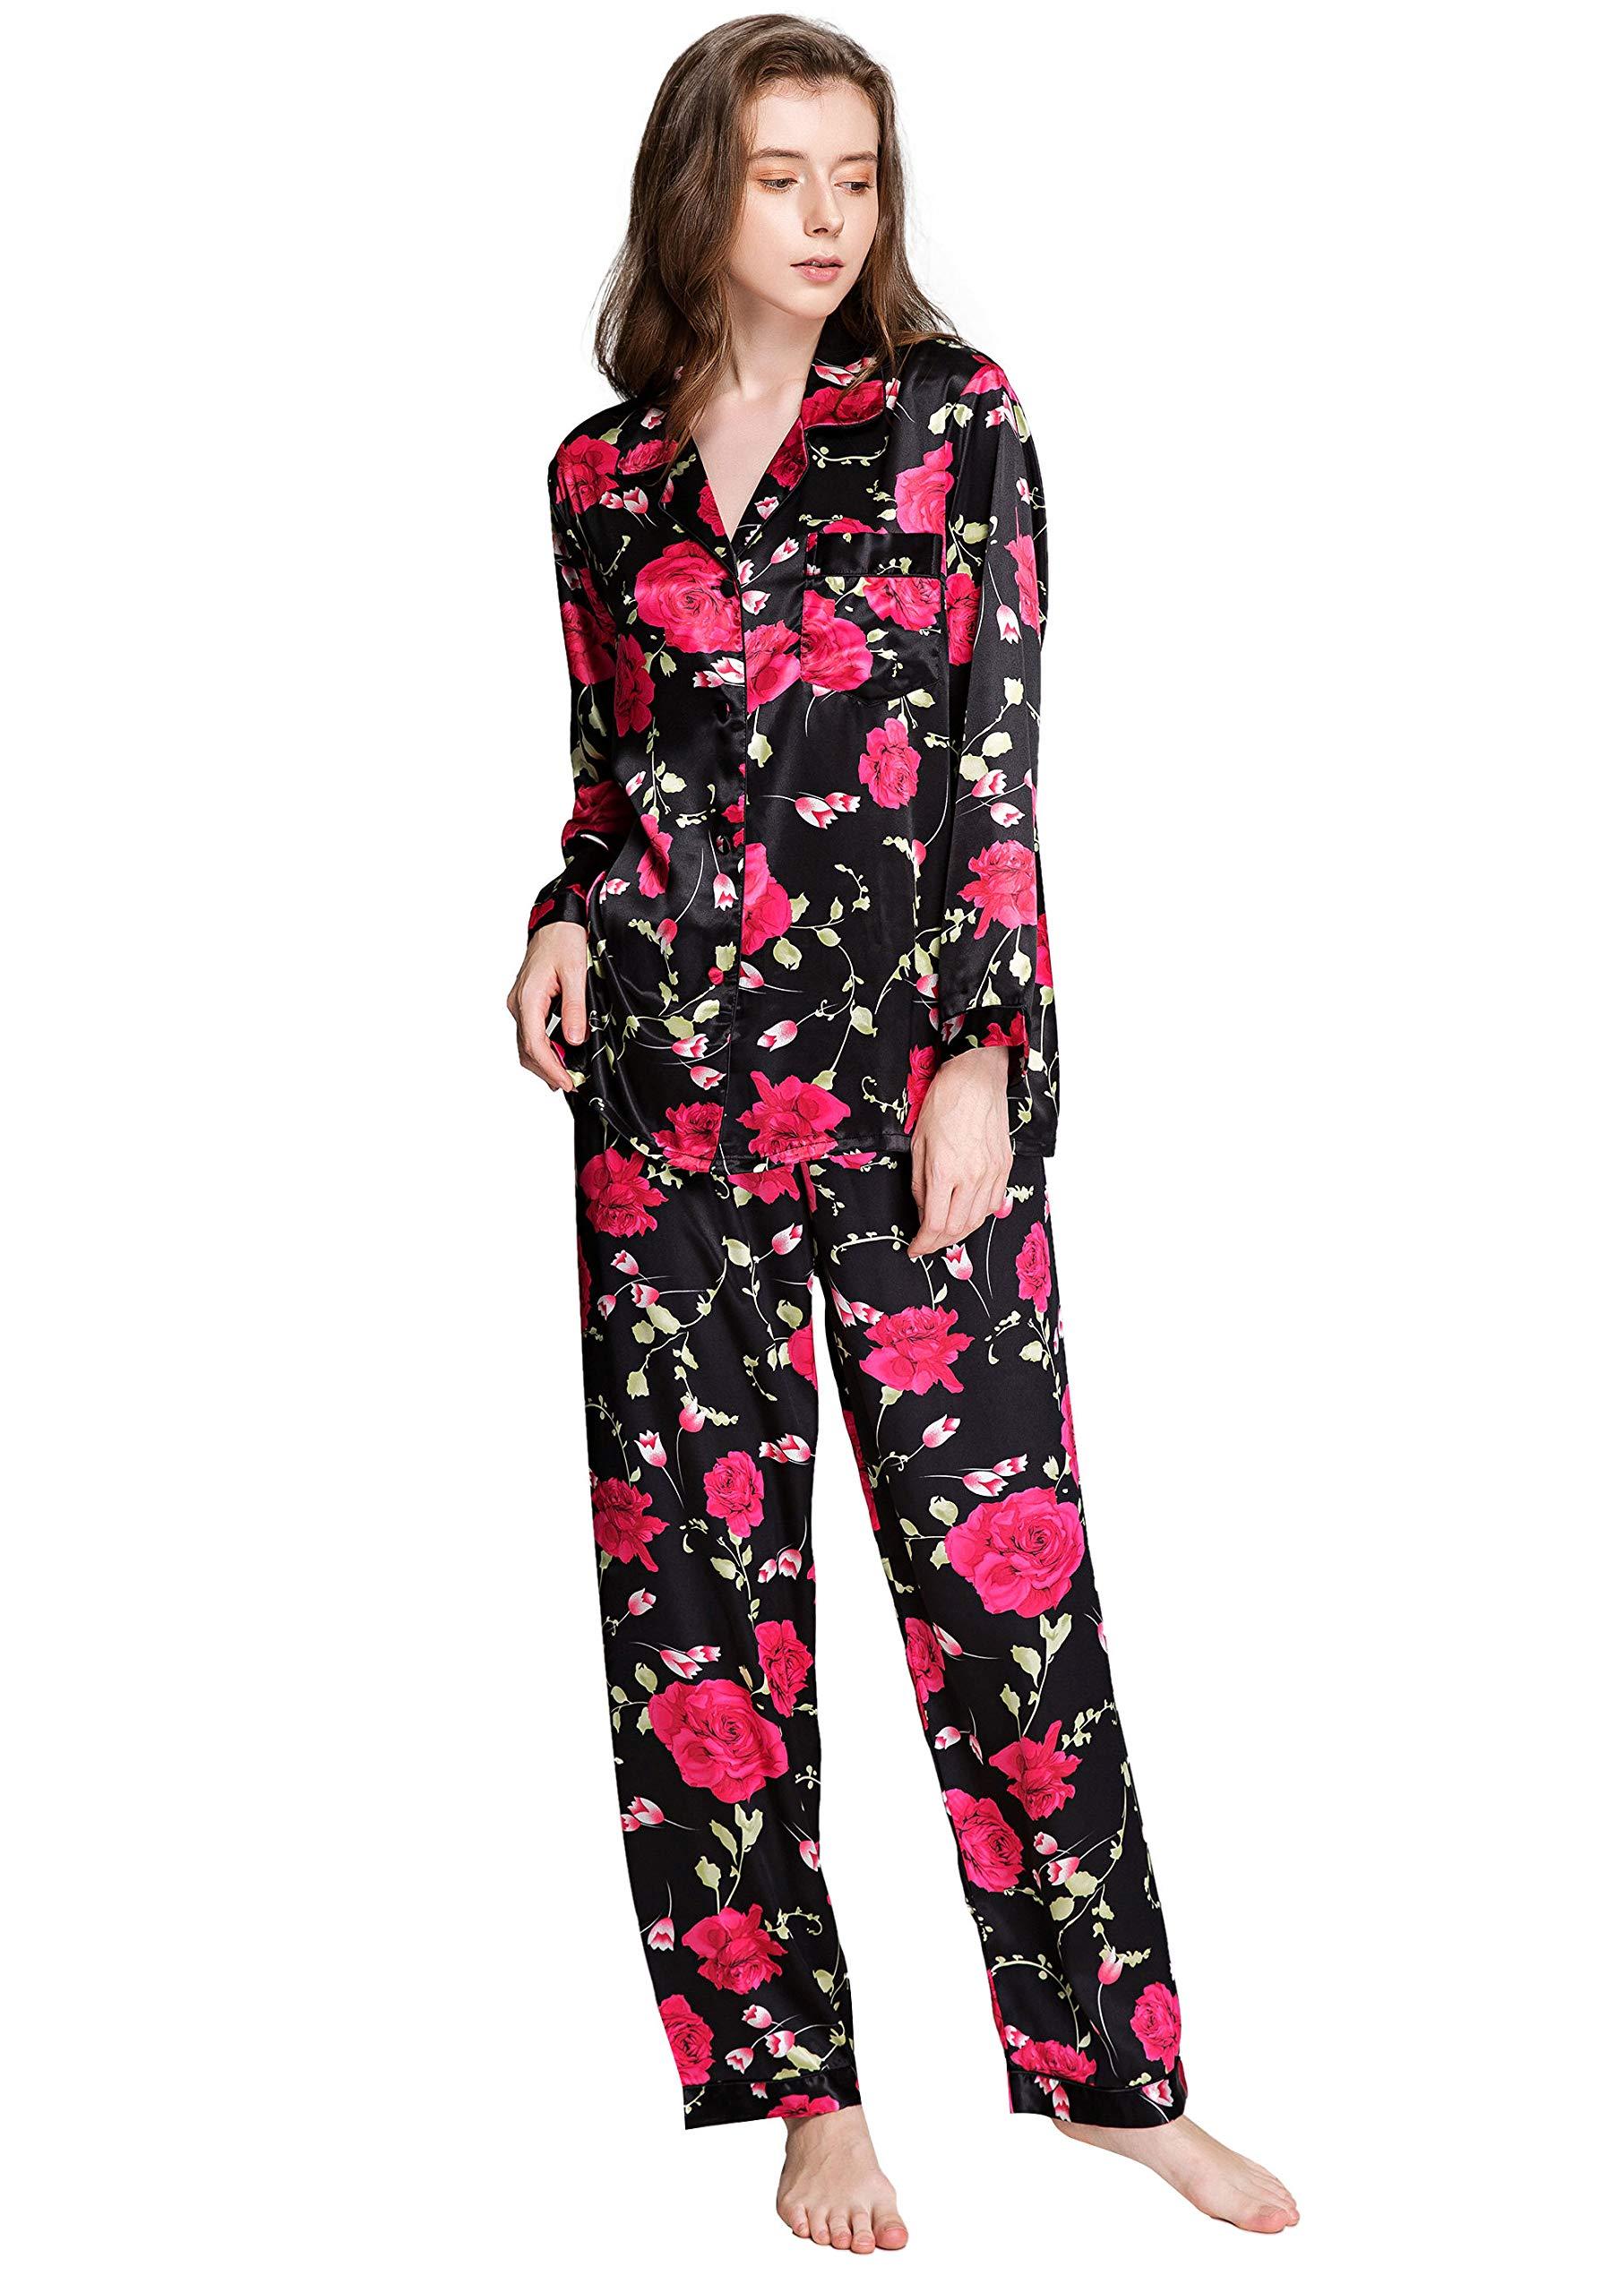 Lonxu Womens Silk Satin Pajamas Set Sleepwear Loungewear XS~3XL Plus